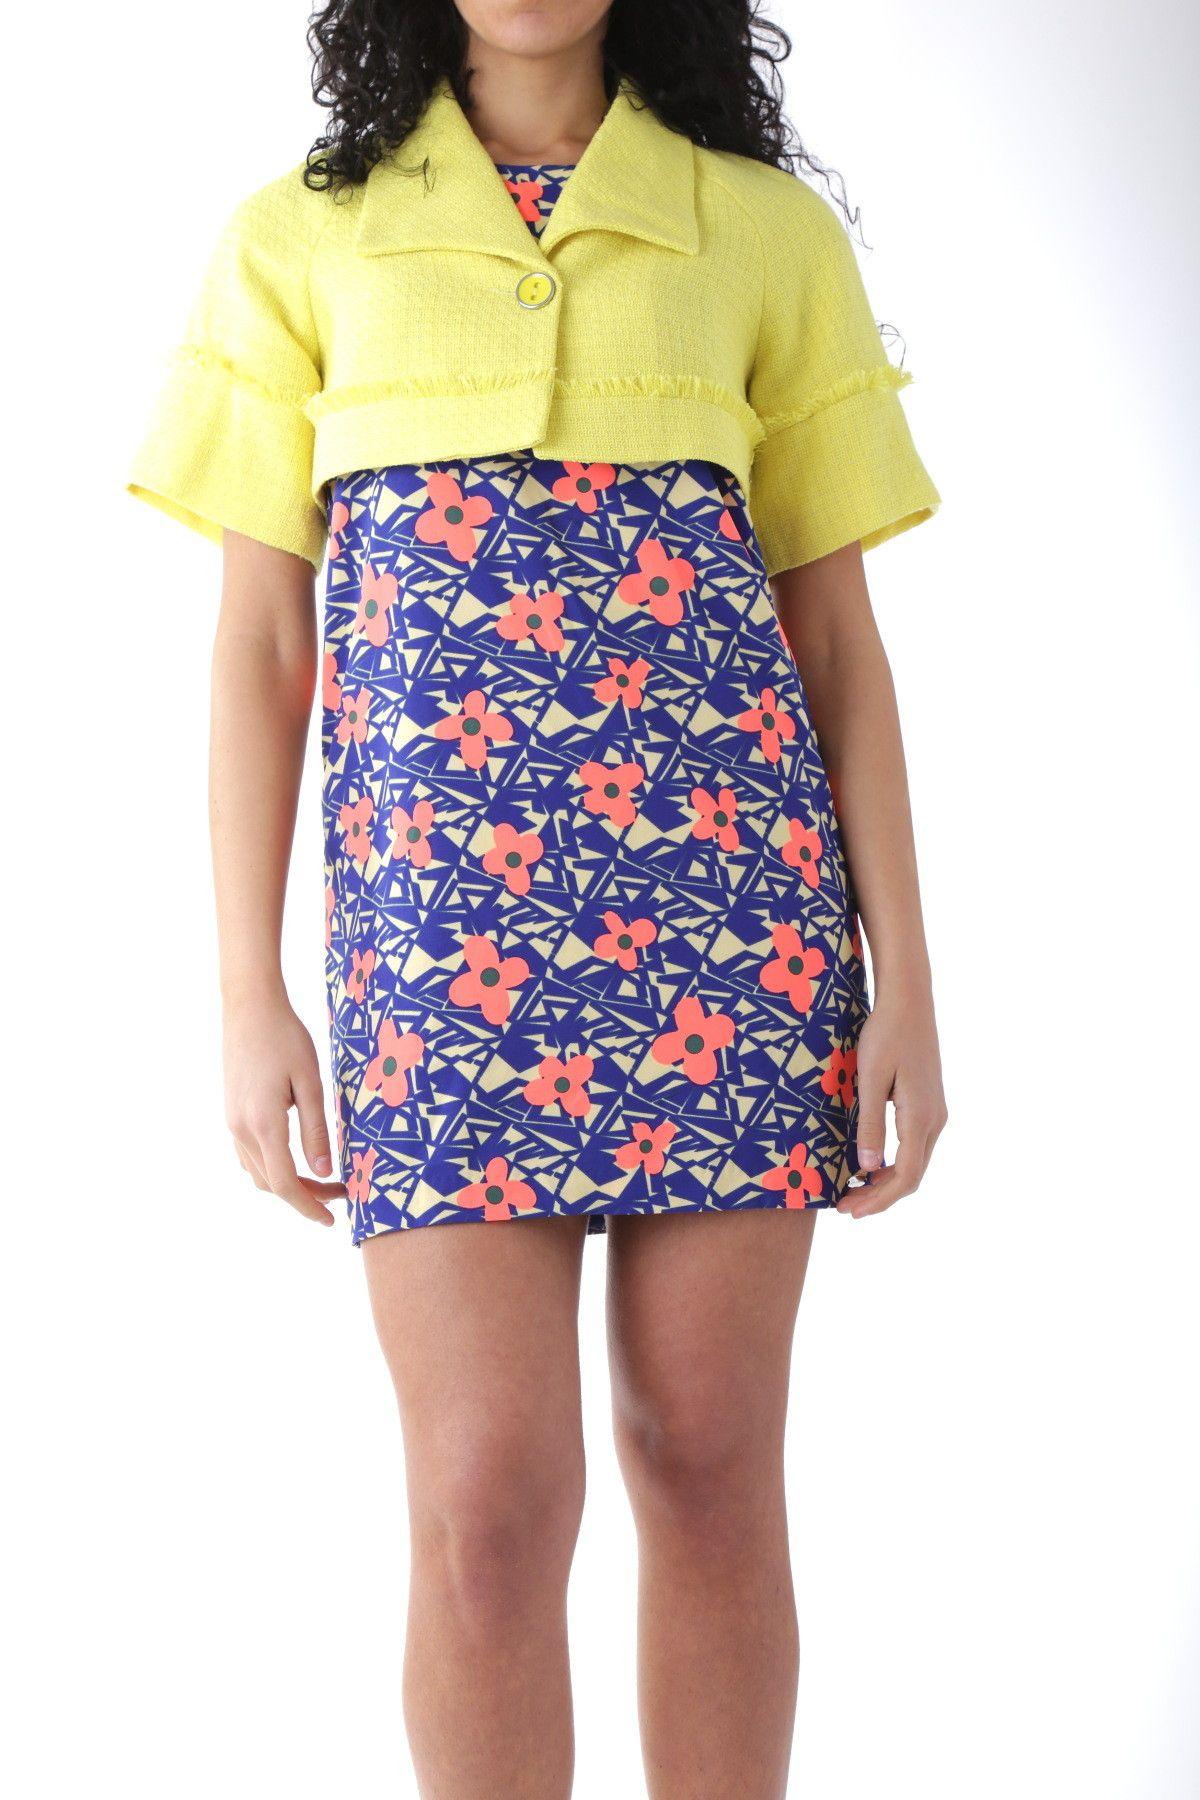 Fornarina Women's Blazer In Yellow